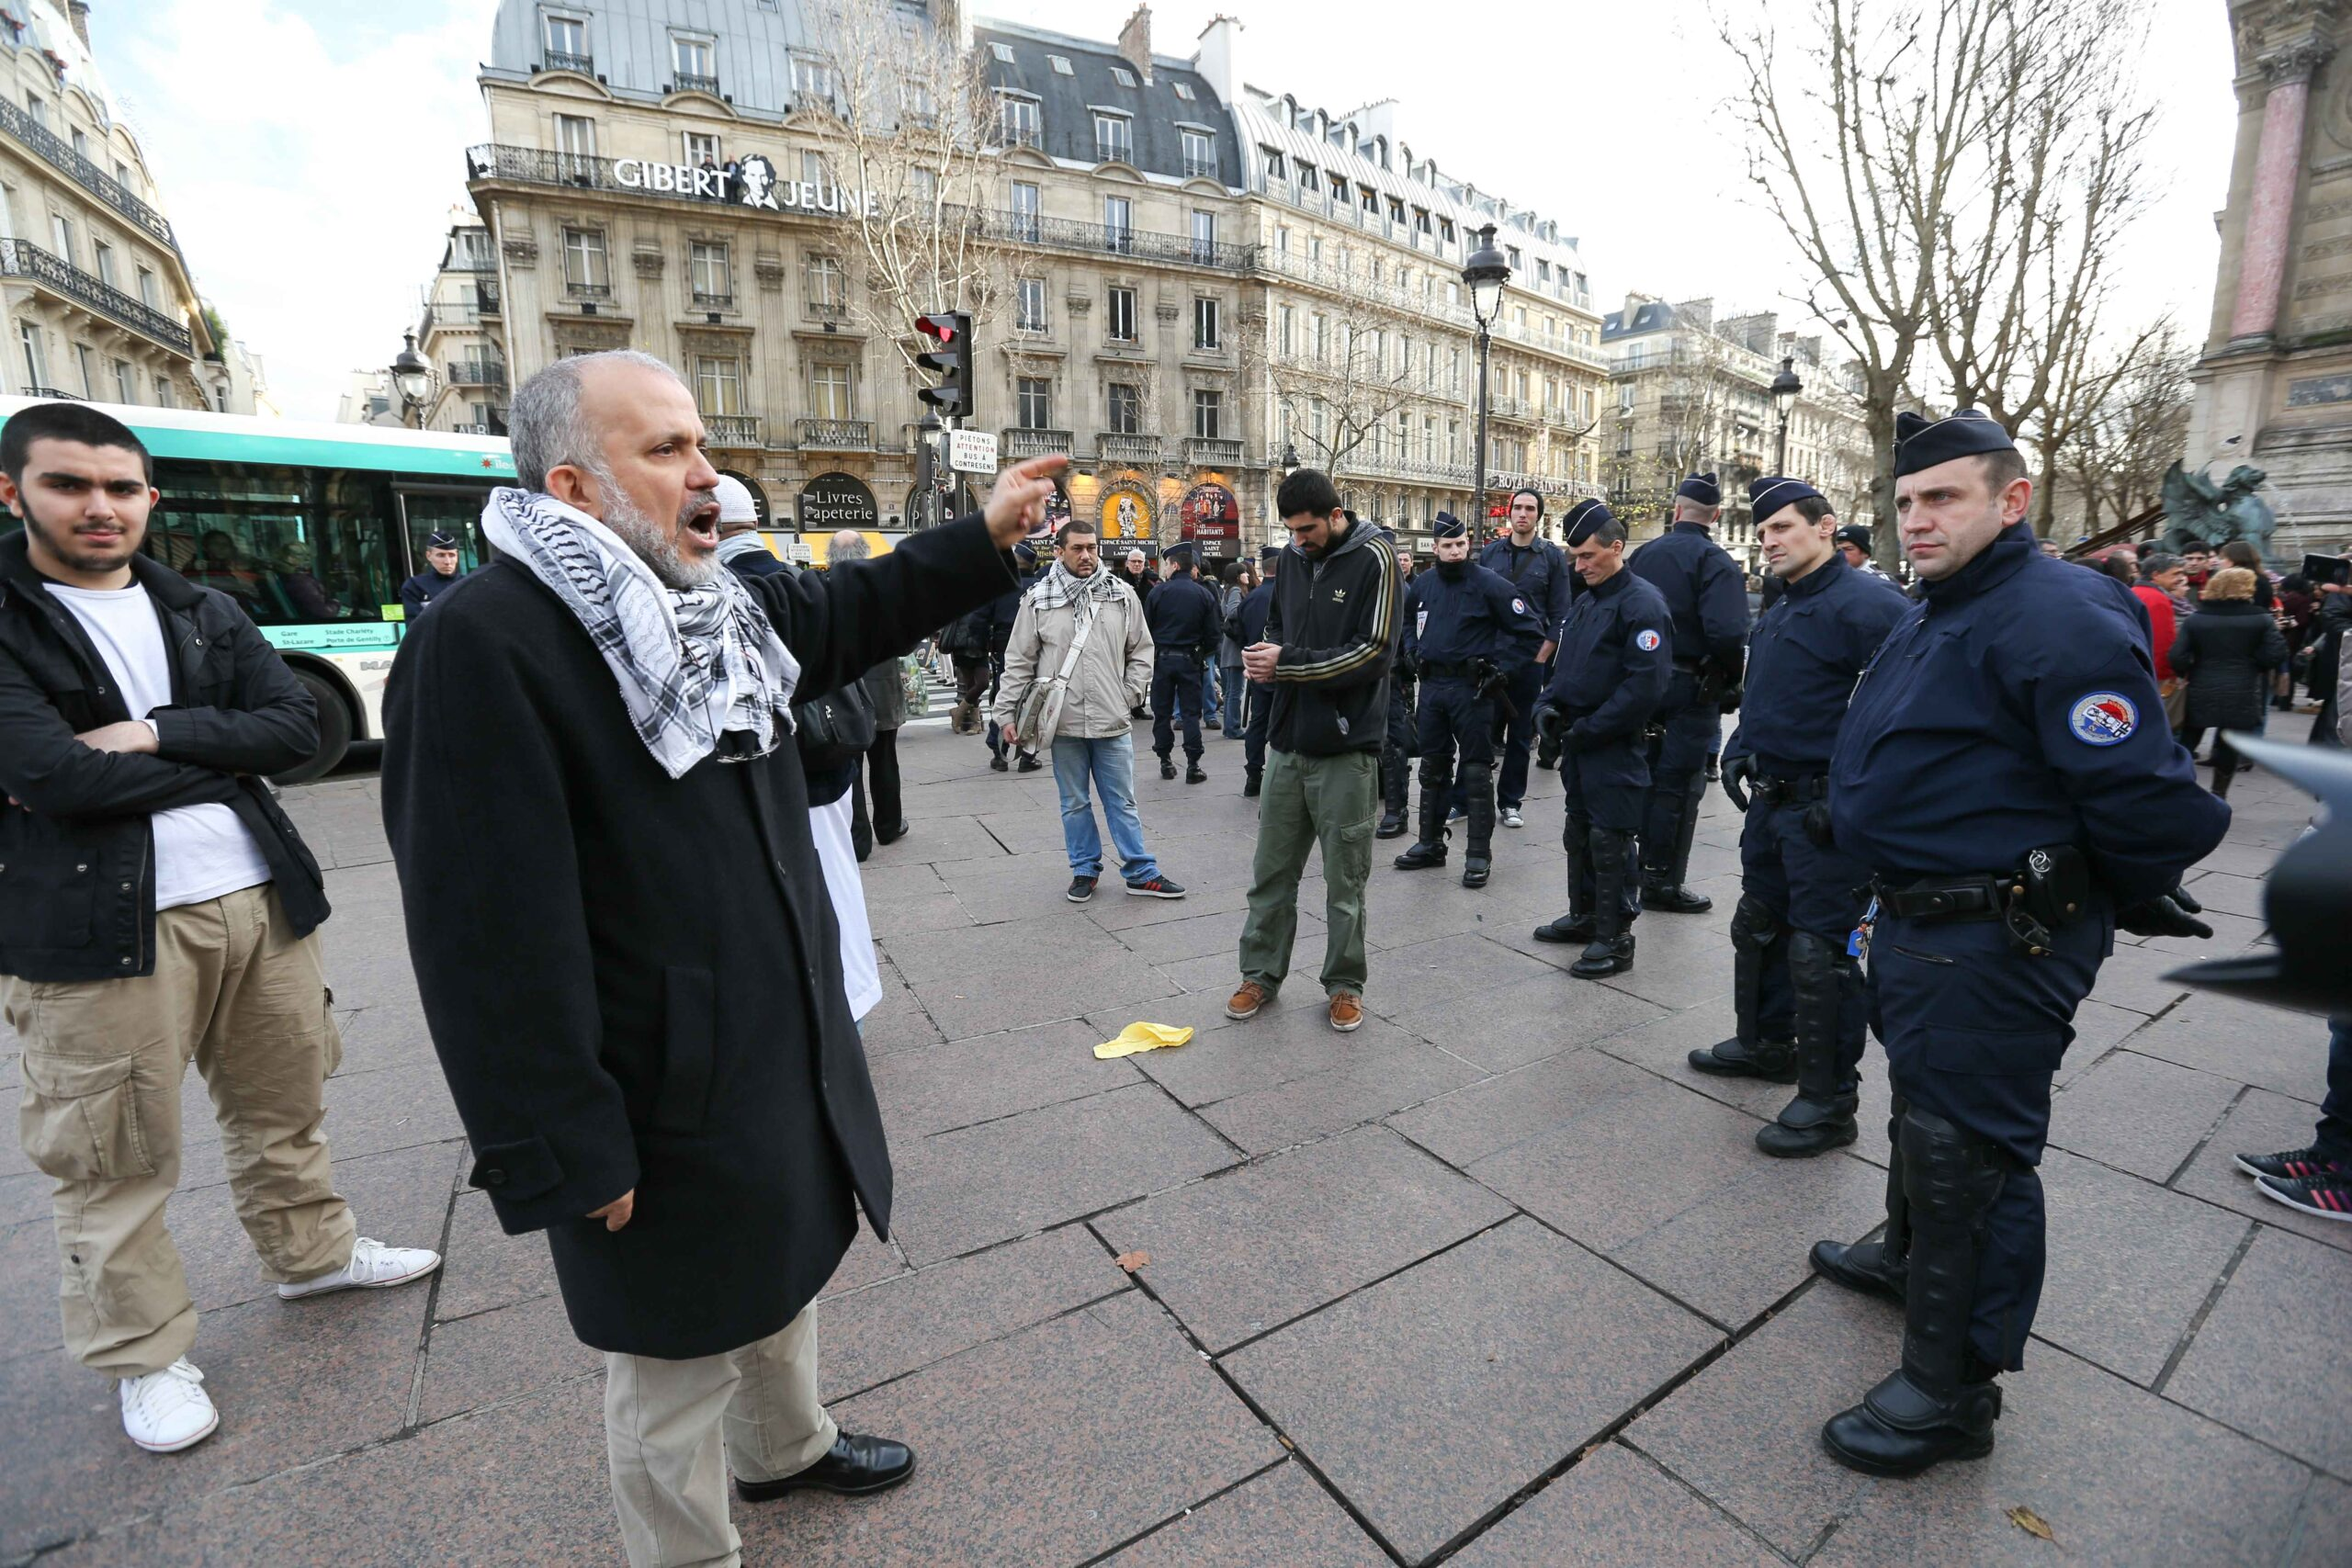 Abdelhakim Sefrioui lors d'une manifestation en 2012. © Michel Stoupak. Sam 29.12.2012.